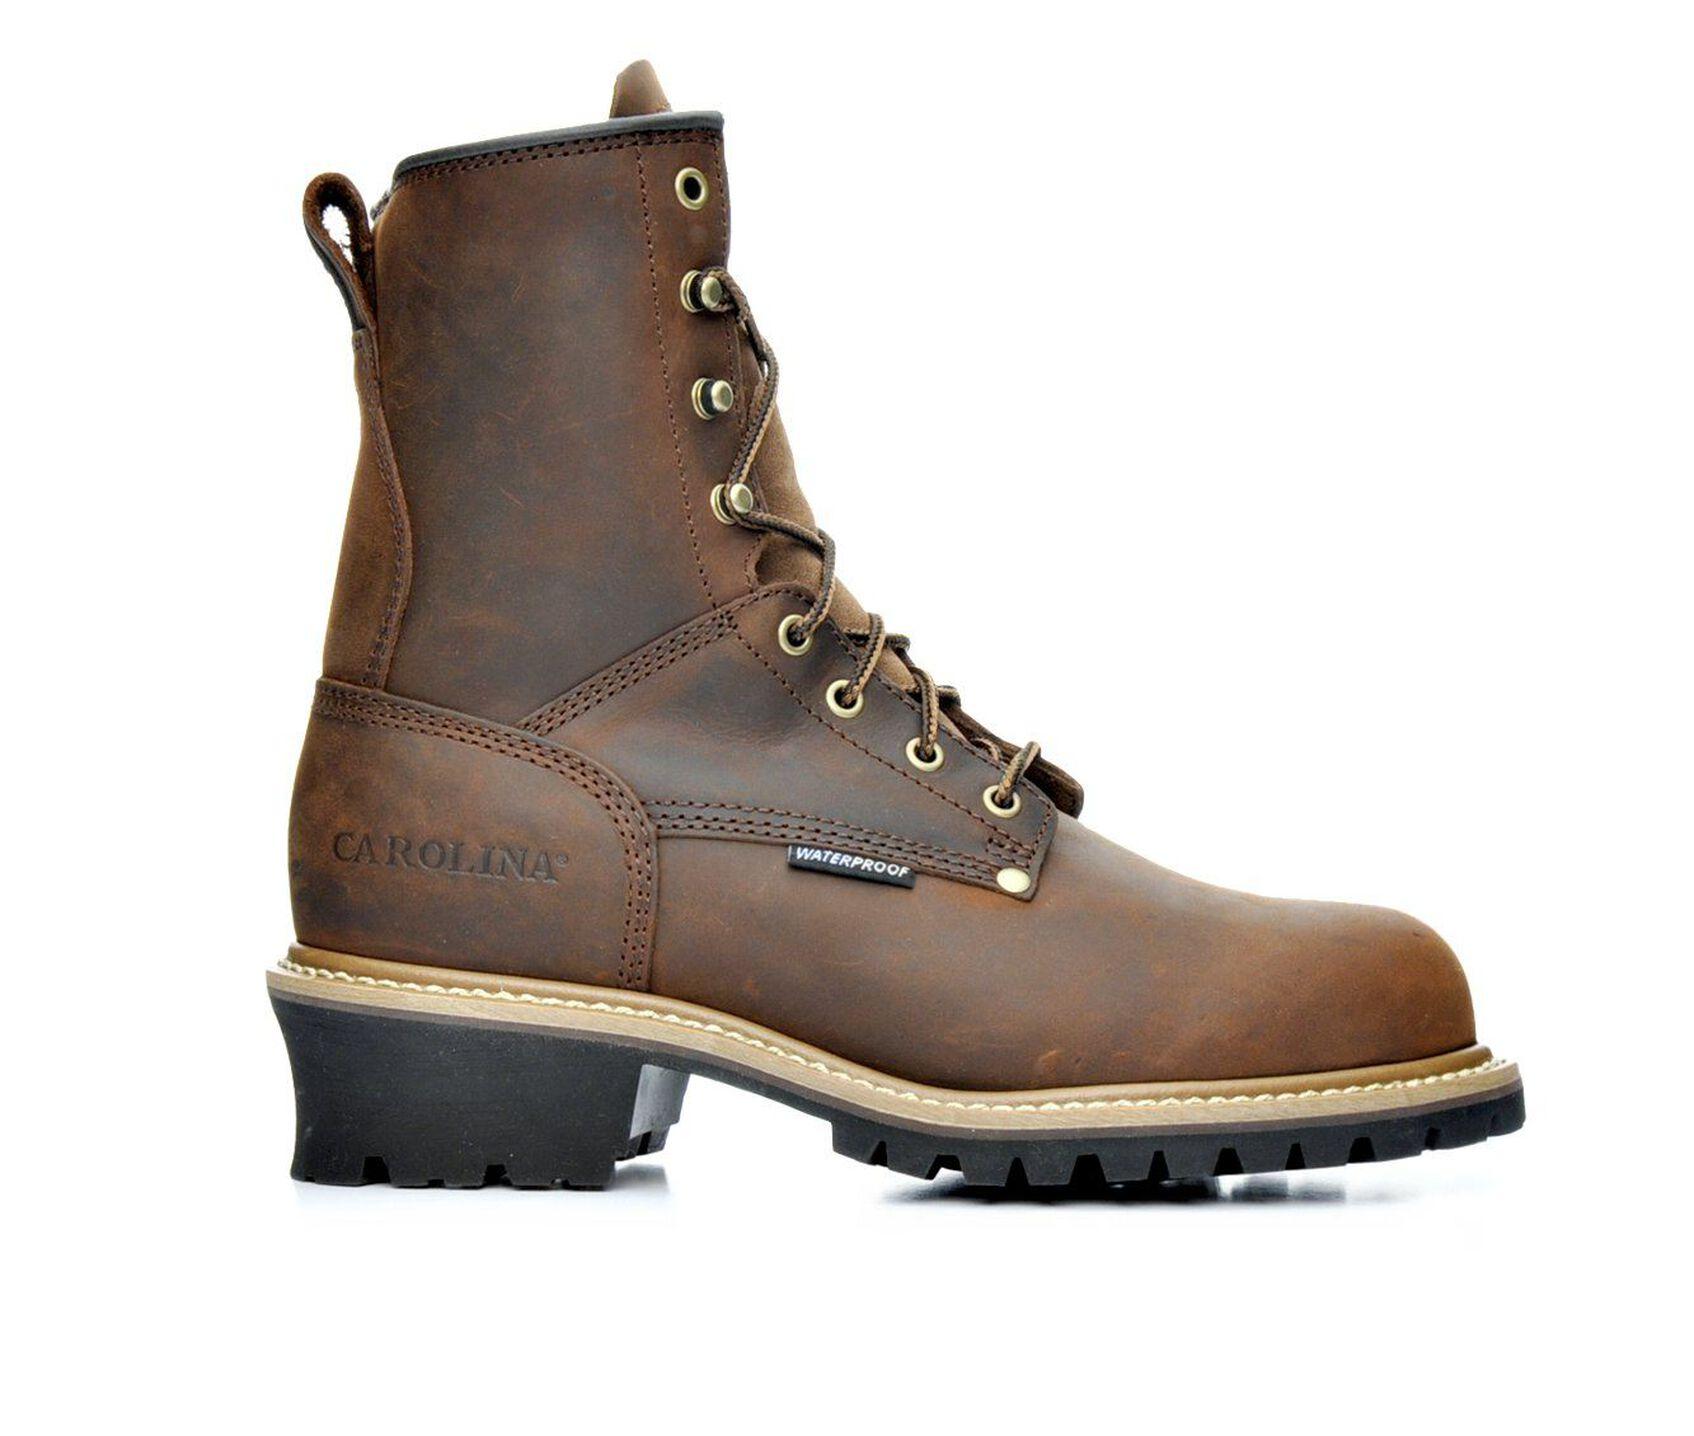 4a9ab6c5018 Men's Carolina Boots CA9821 8 In Steel Toe Waterproof Logging Work Boots